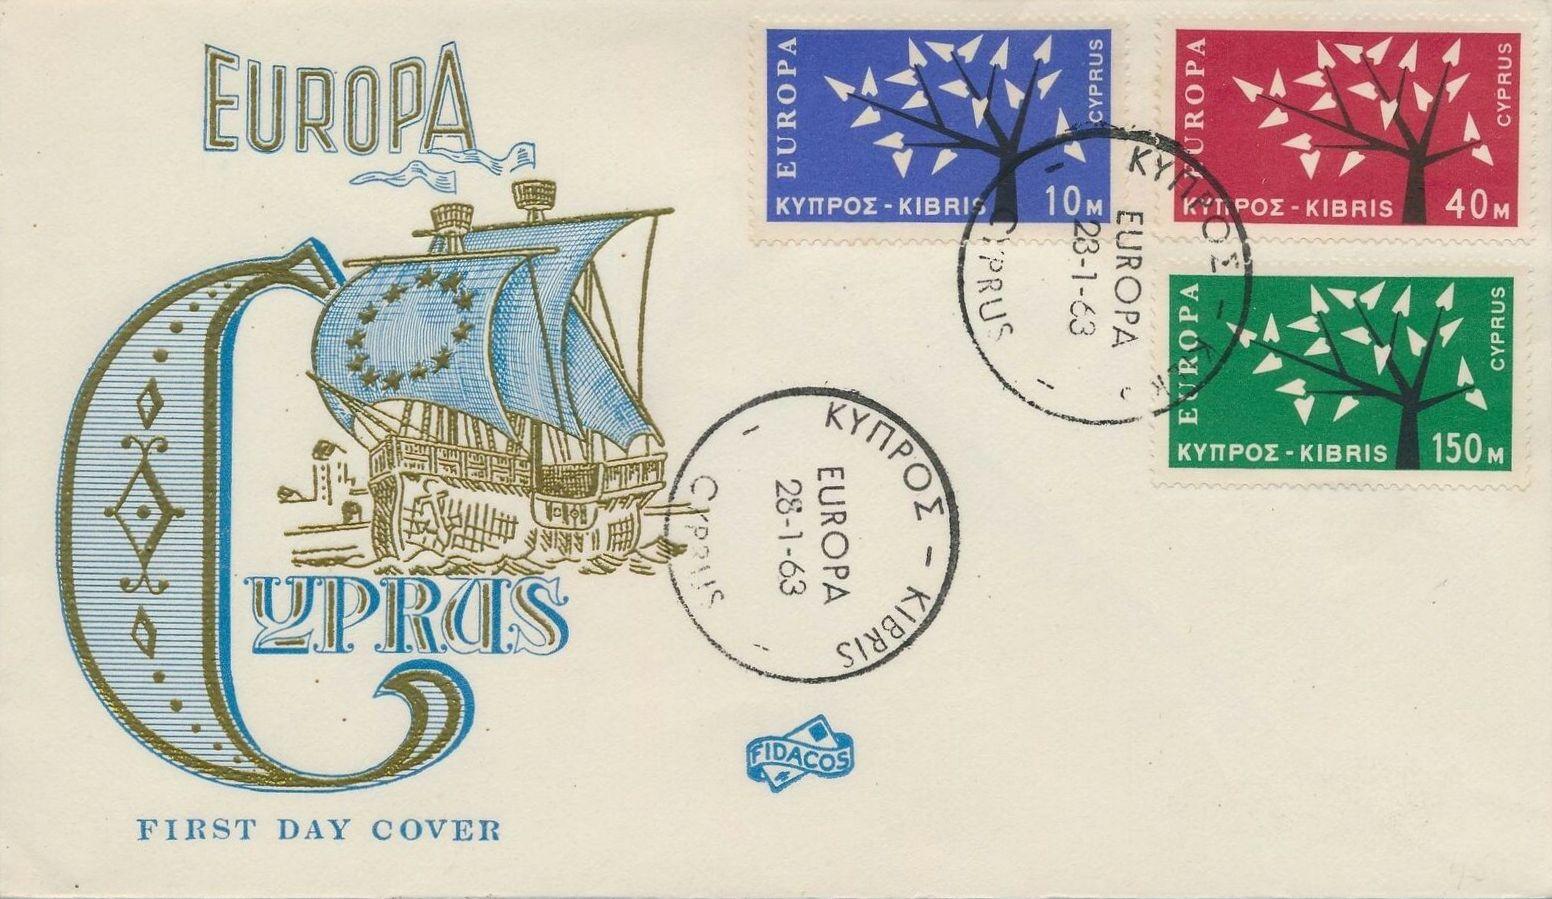 Cyprus 1963 EUROPA - CEPT FDCa.jpg